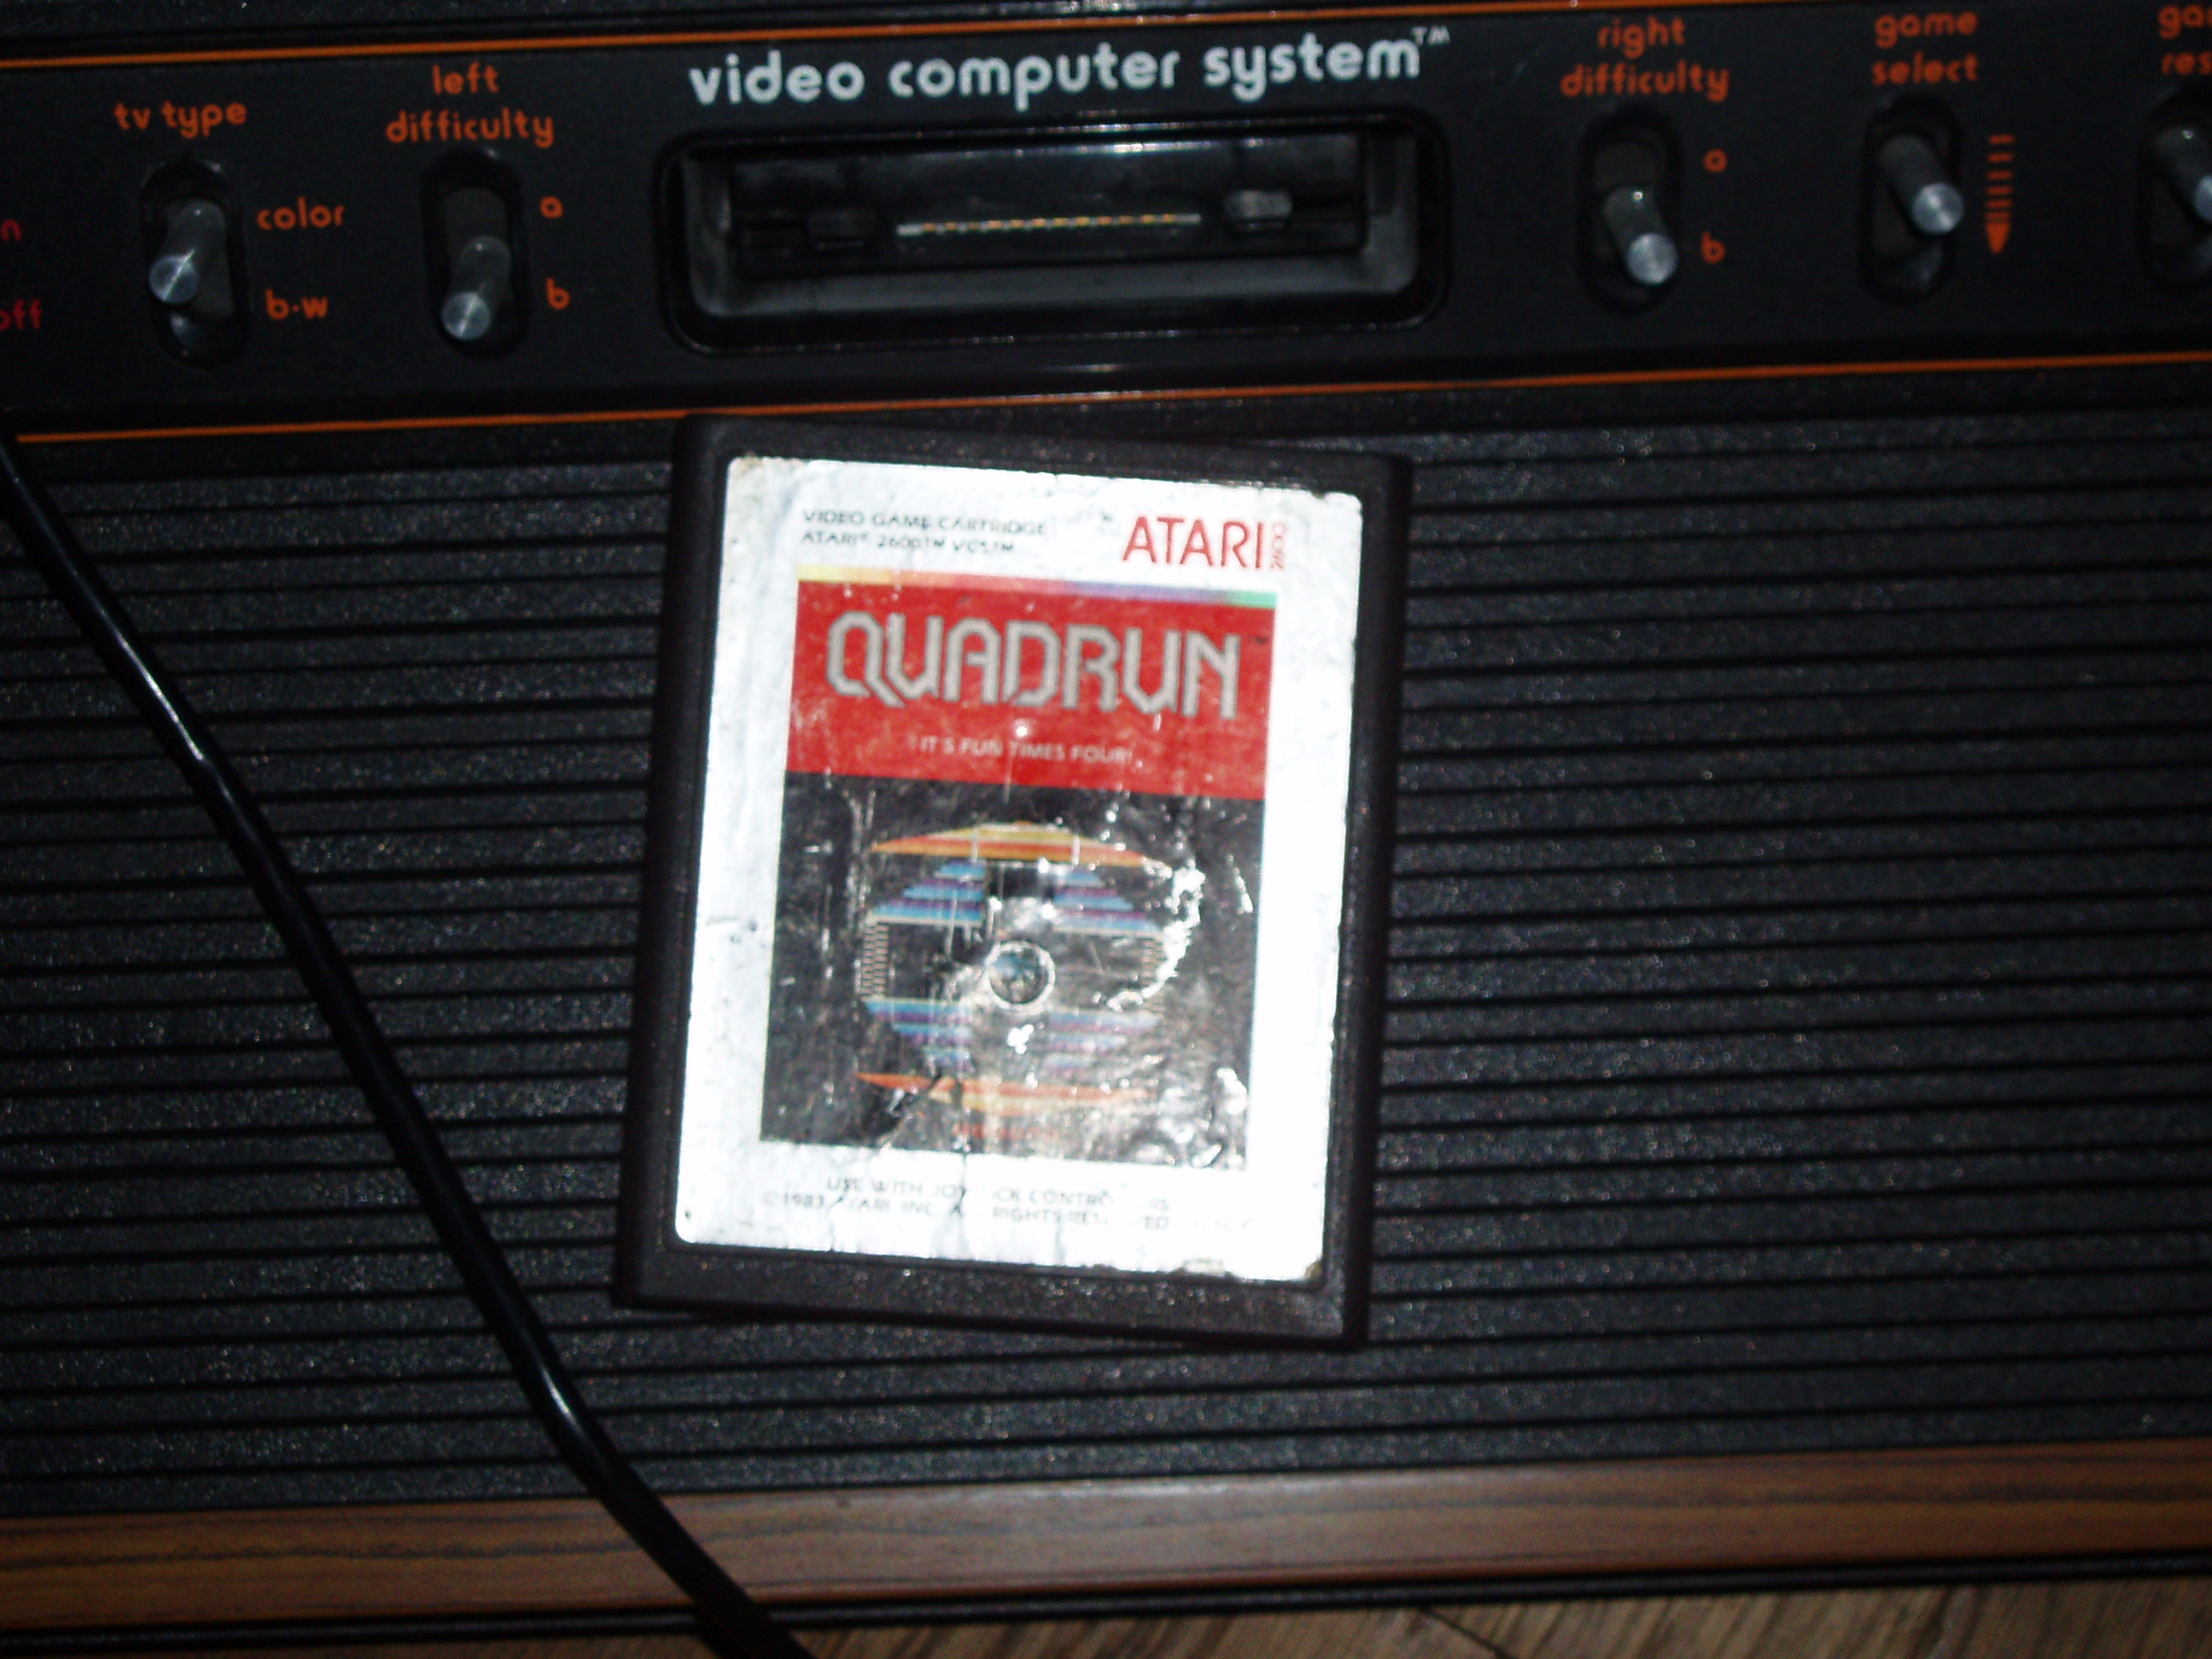 atari2600forever: Quadrun (Atari 2600 Novice/B) 3,000 points on 2019-01-10 03:17:13